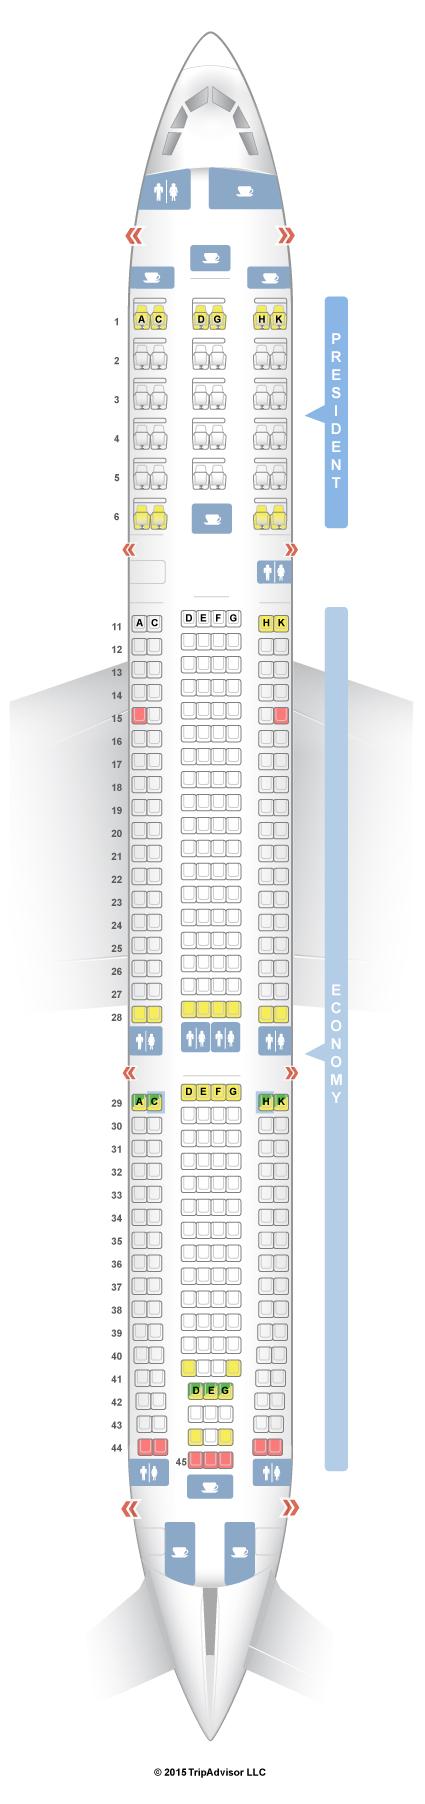 Seatguru Seat Map Aeroflot Airbus A330 300 333 V1